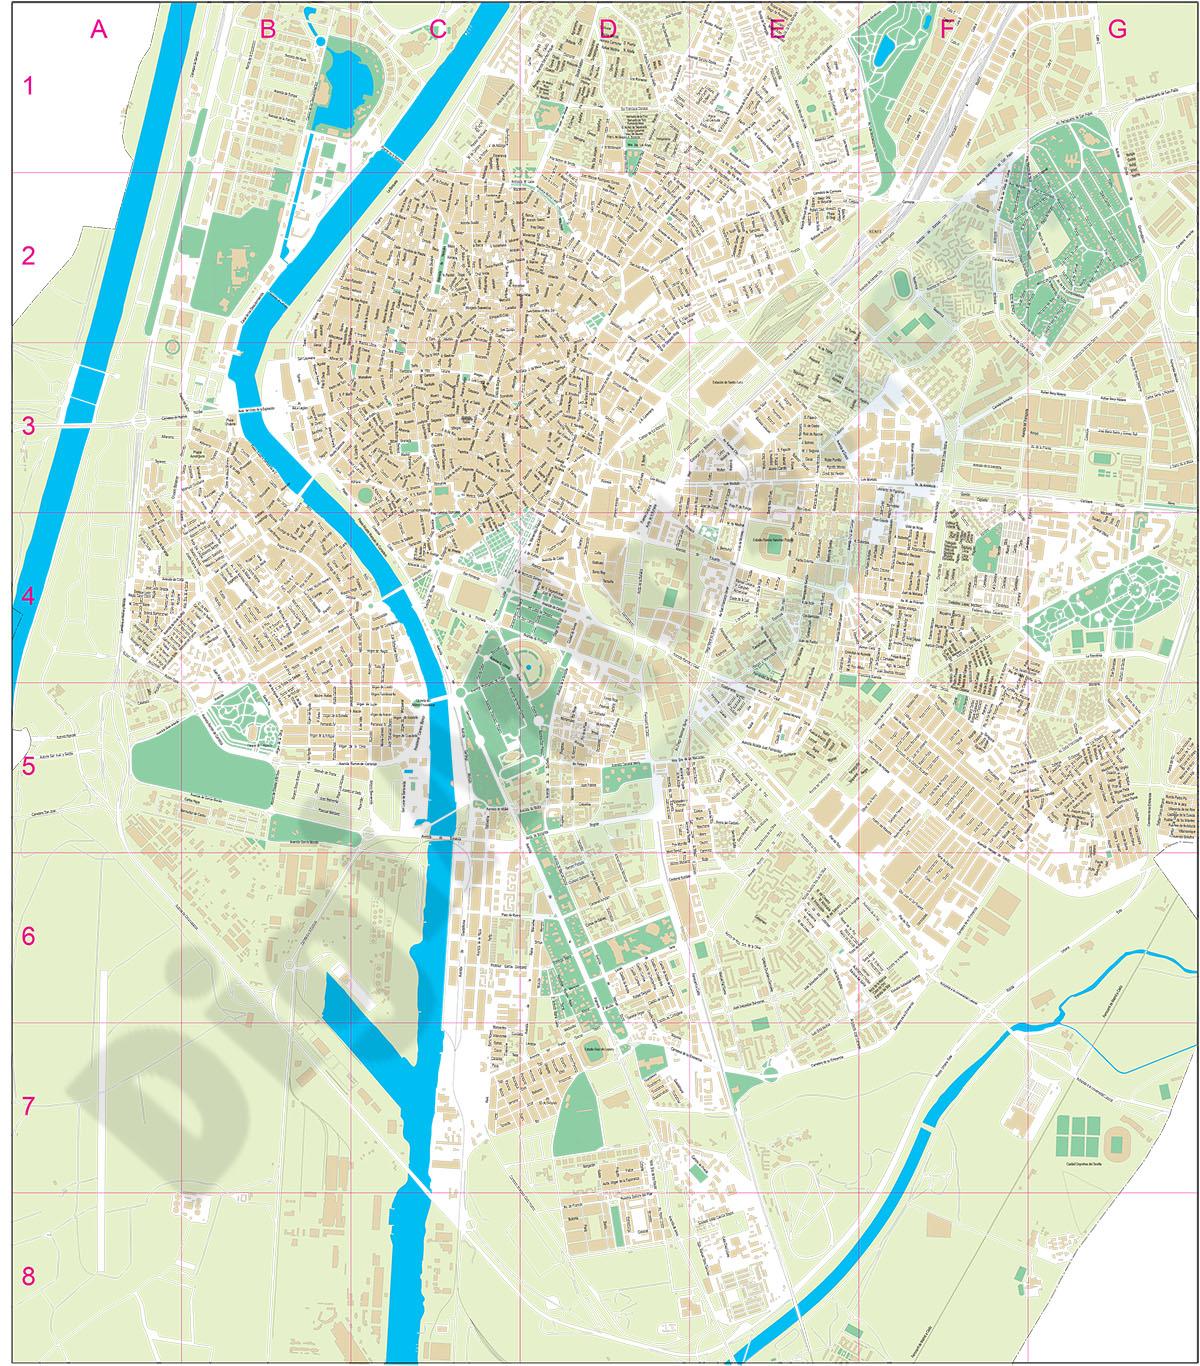 Sevilla - city map